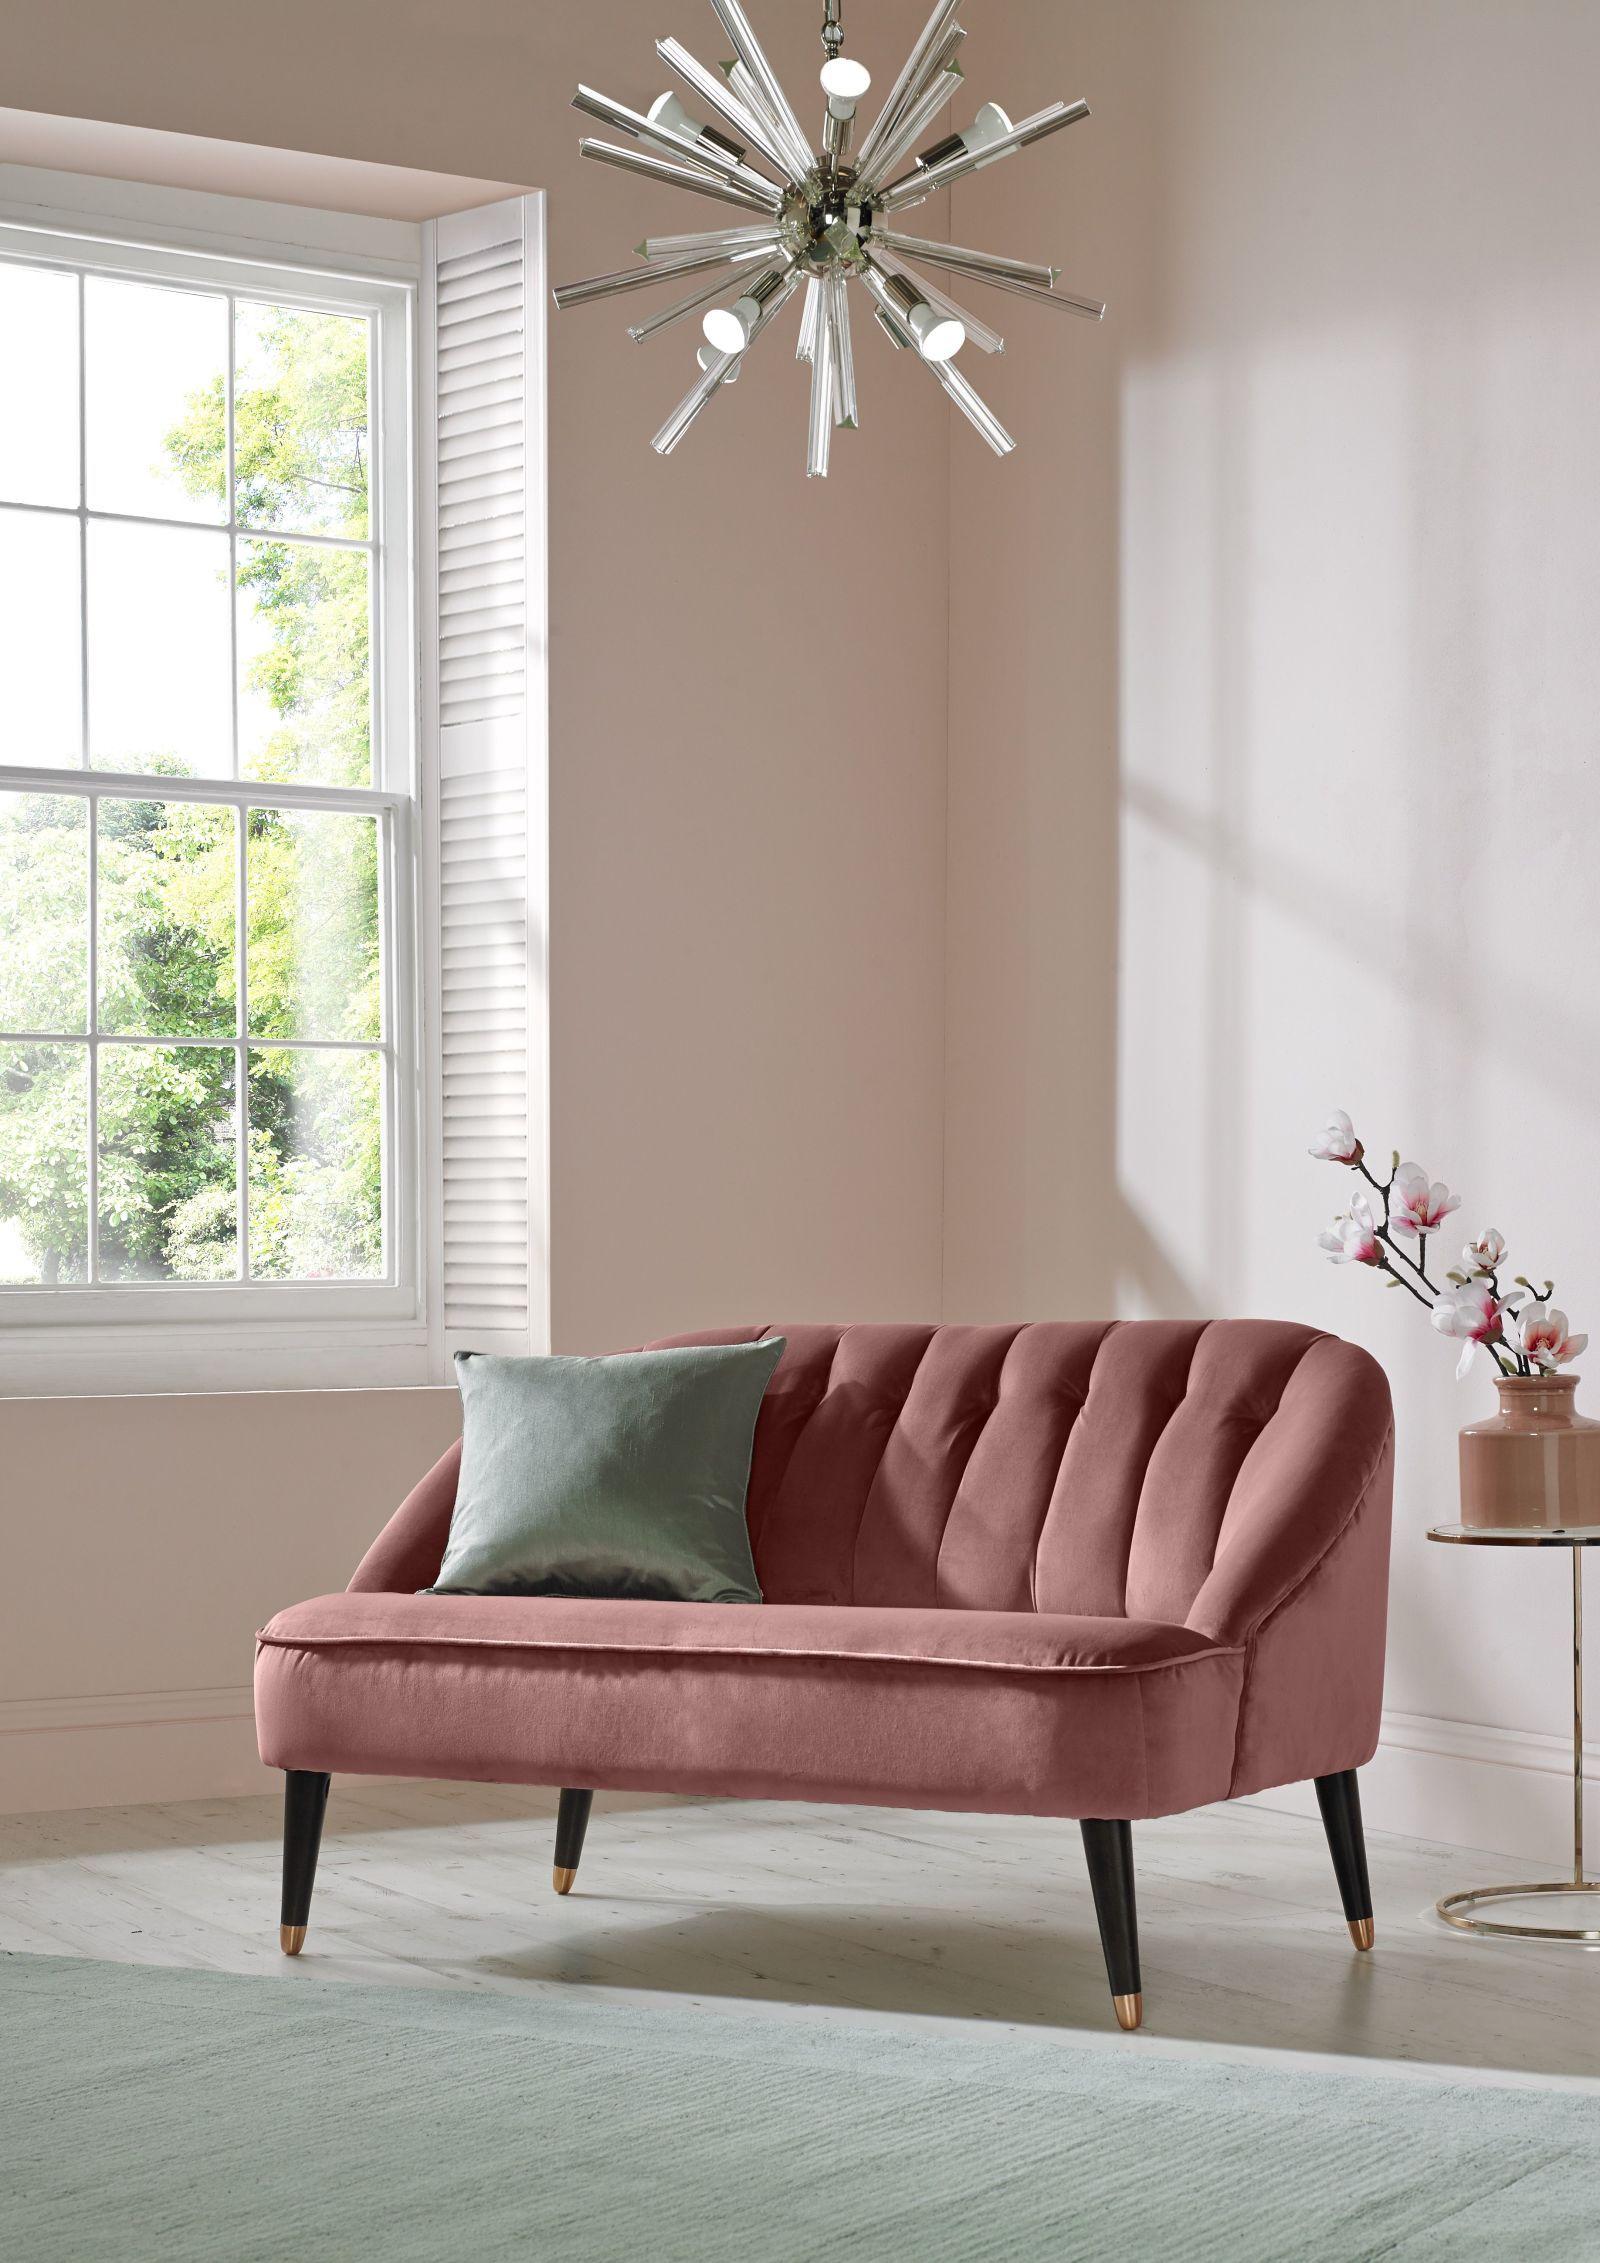 47+ Living room paint color ideas 2018 info